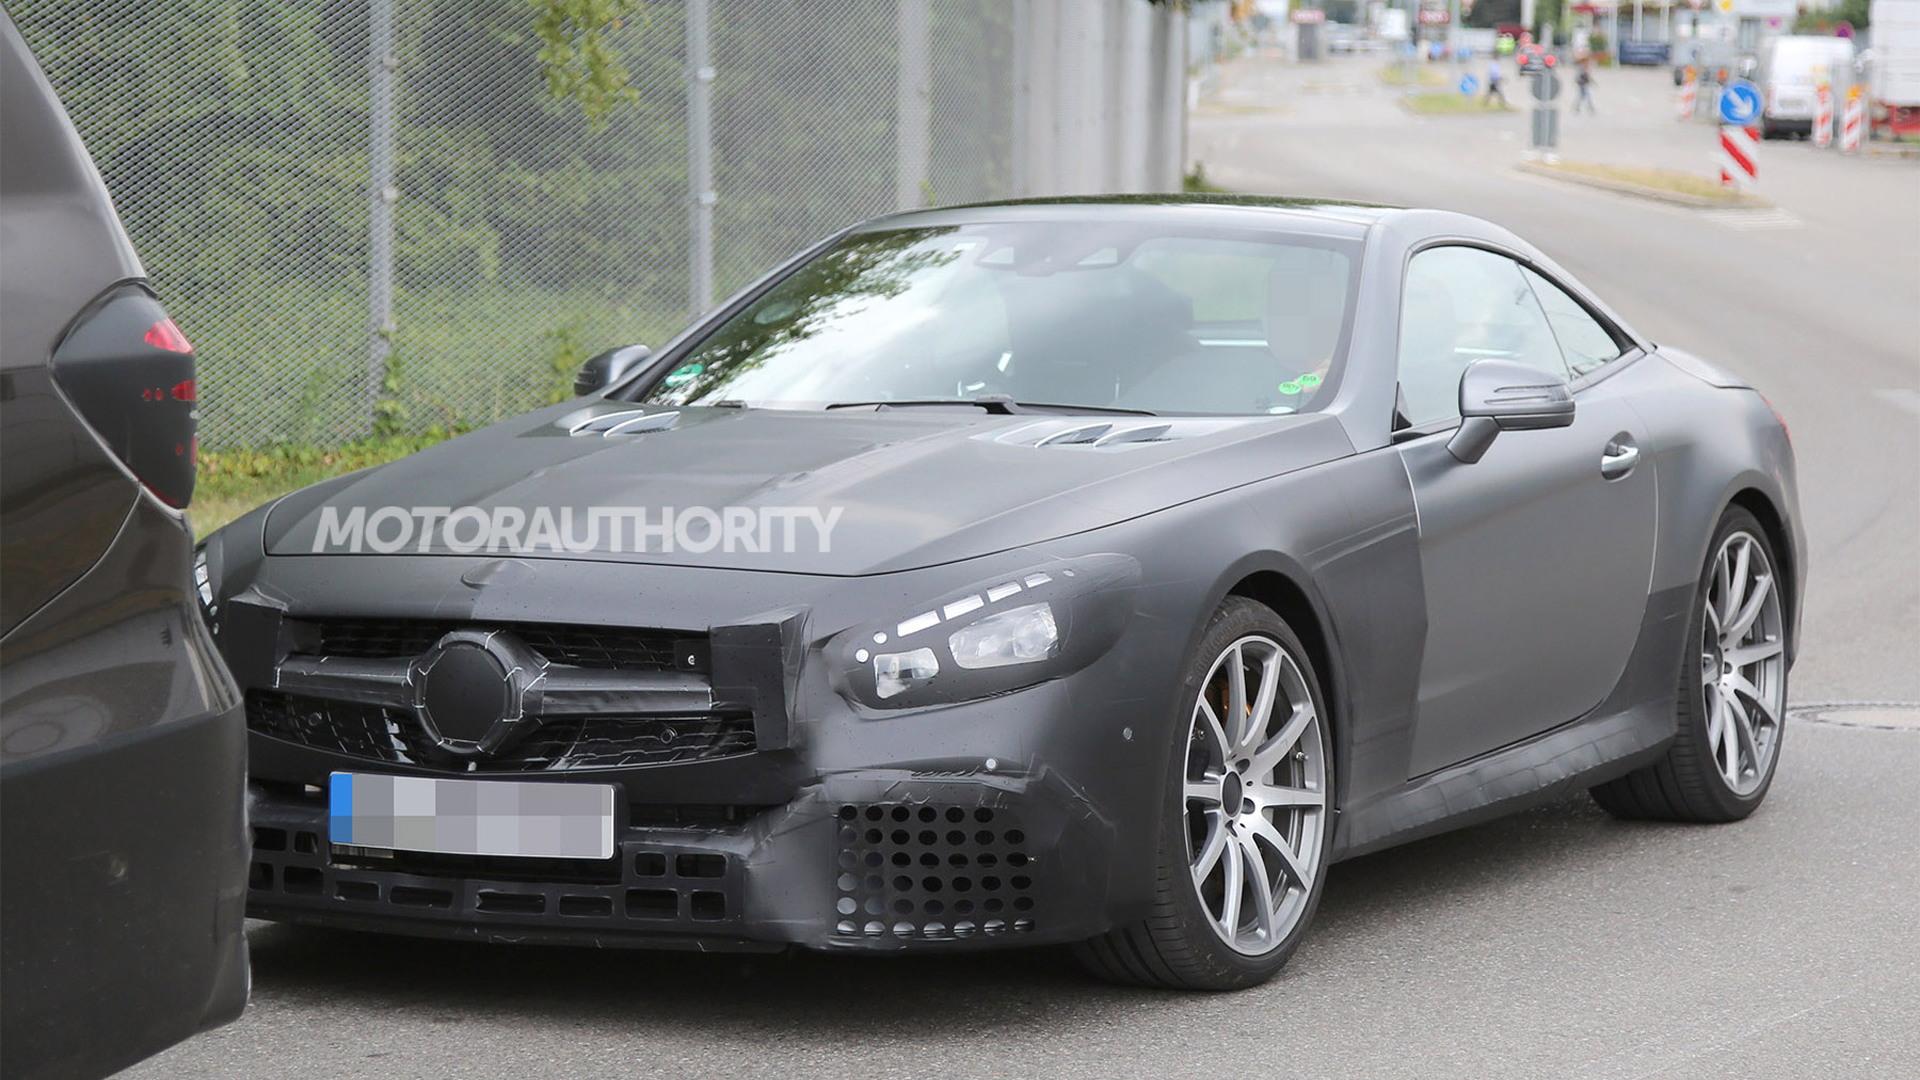 2017 Mercedes-AMG SL63 facelift spy shots - S. Baldauf/SB-Medien